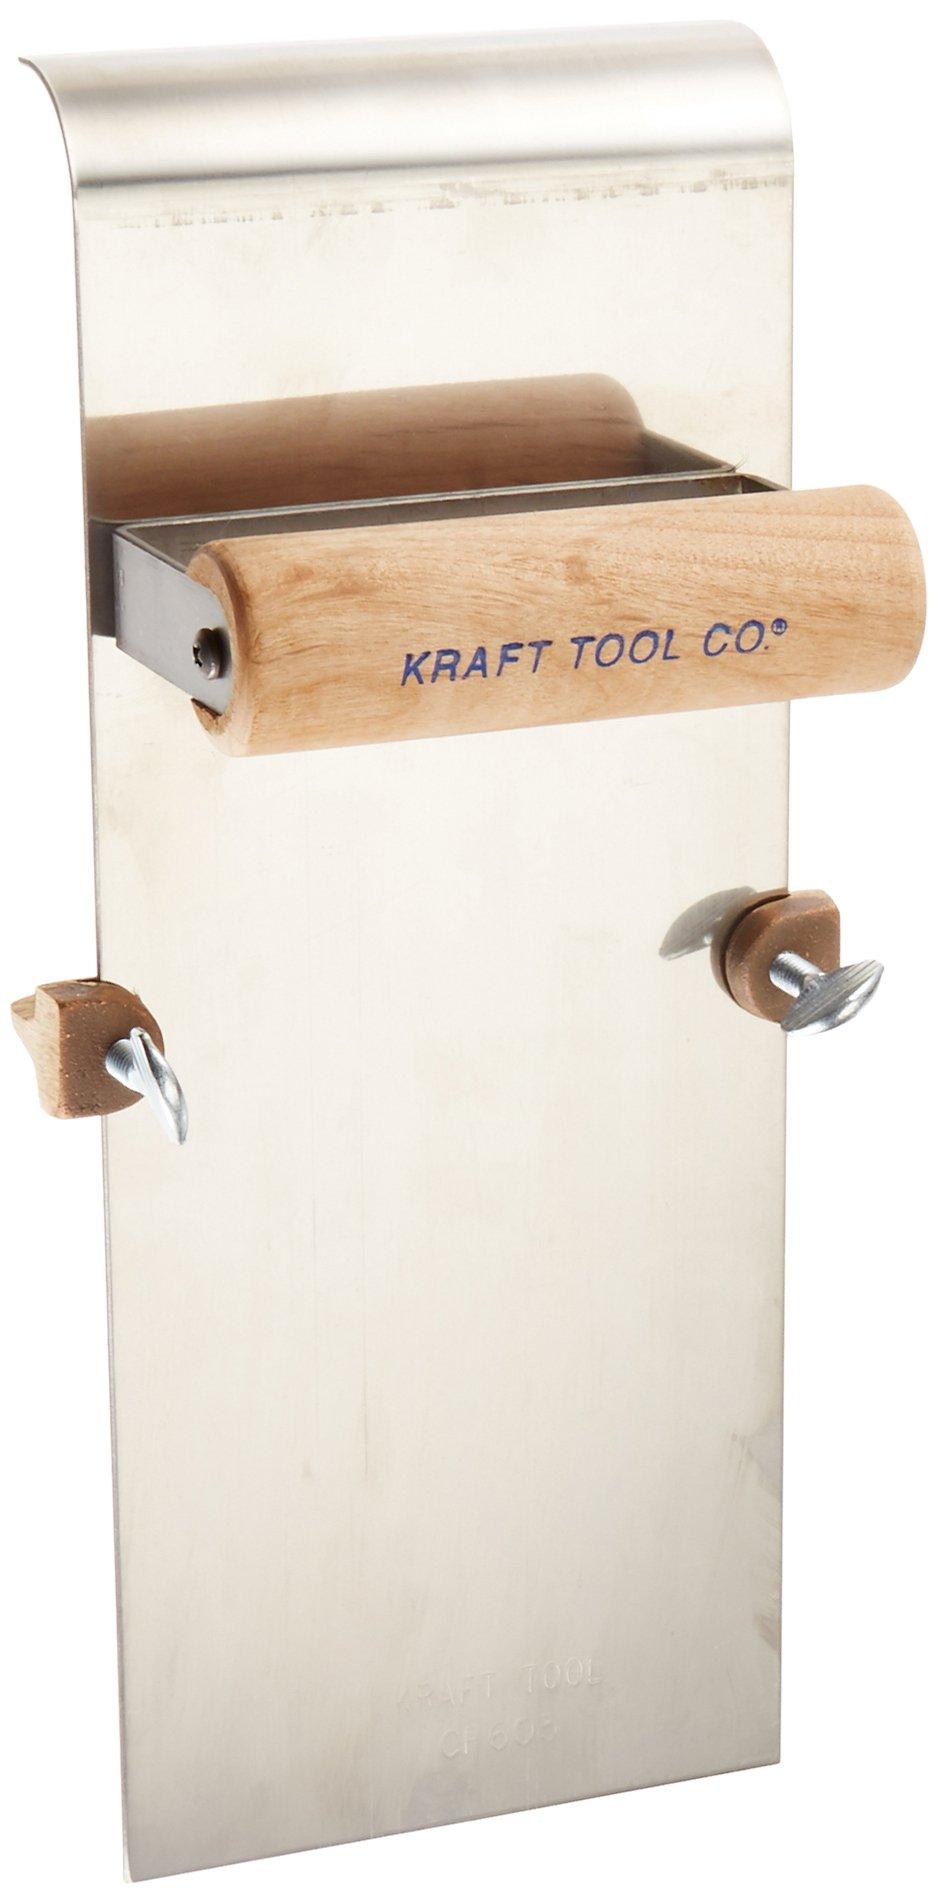 Kraft Tool CF605 Stainless Steel Edger with Adjustable Groover 3/4-Inch Radius